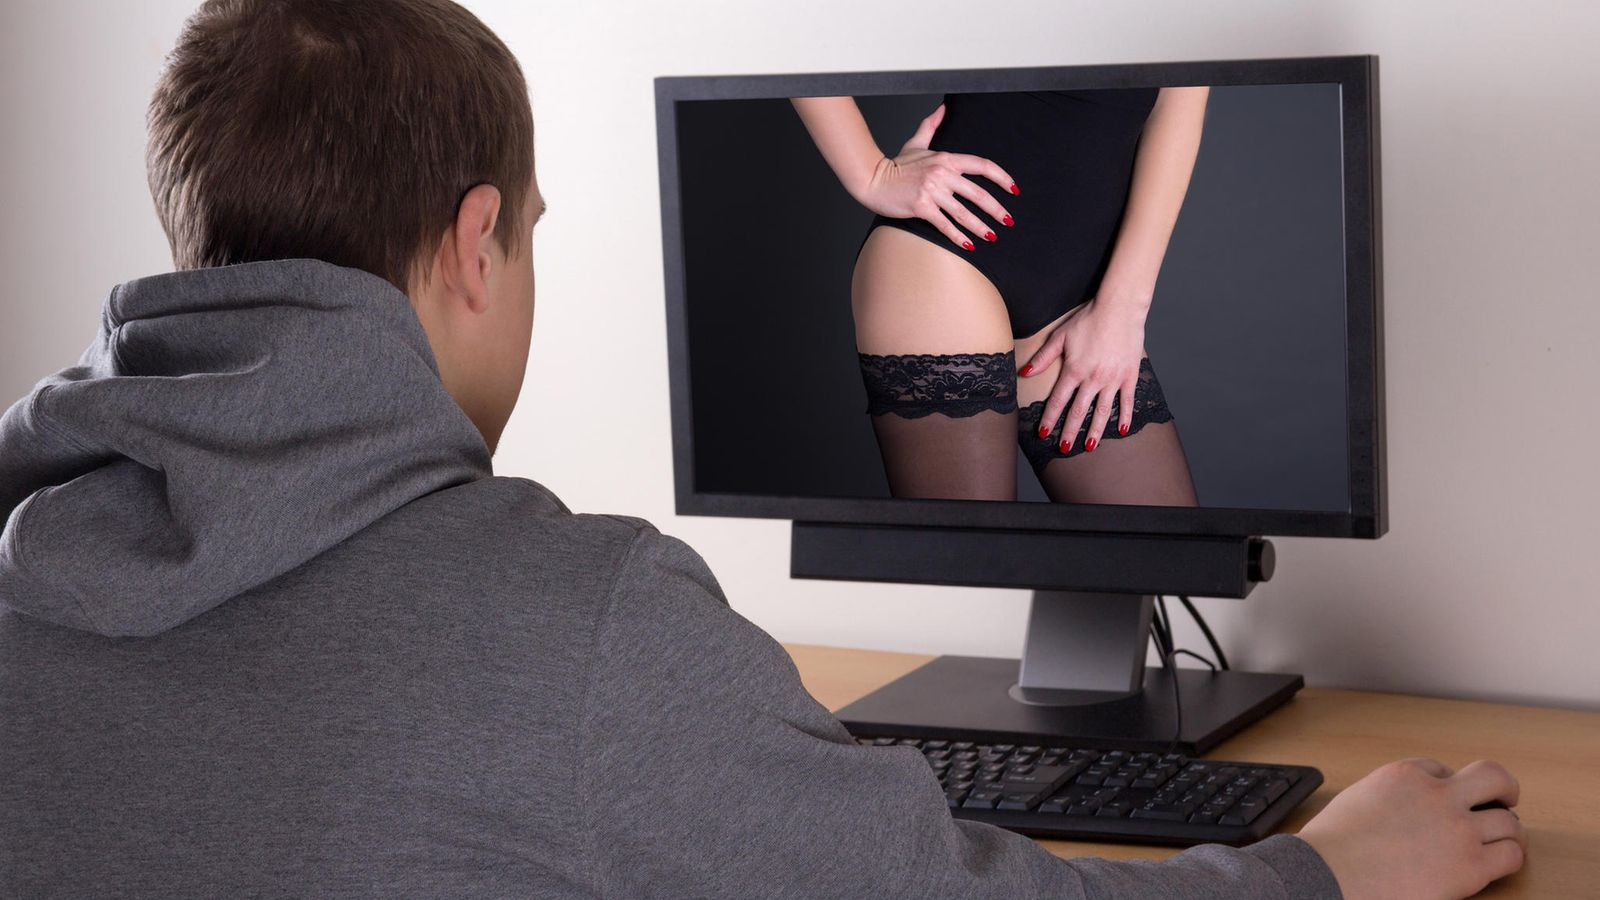 koti porno videot Pyhajarvi